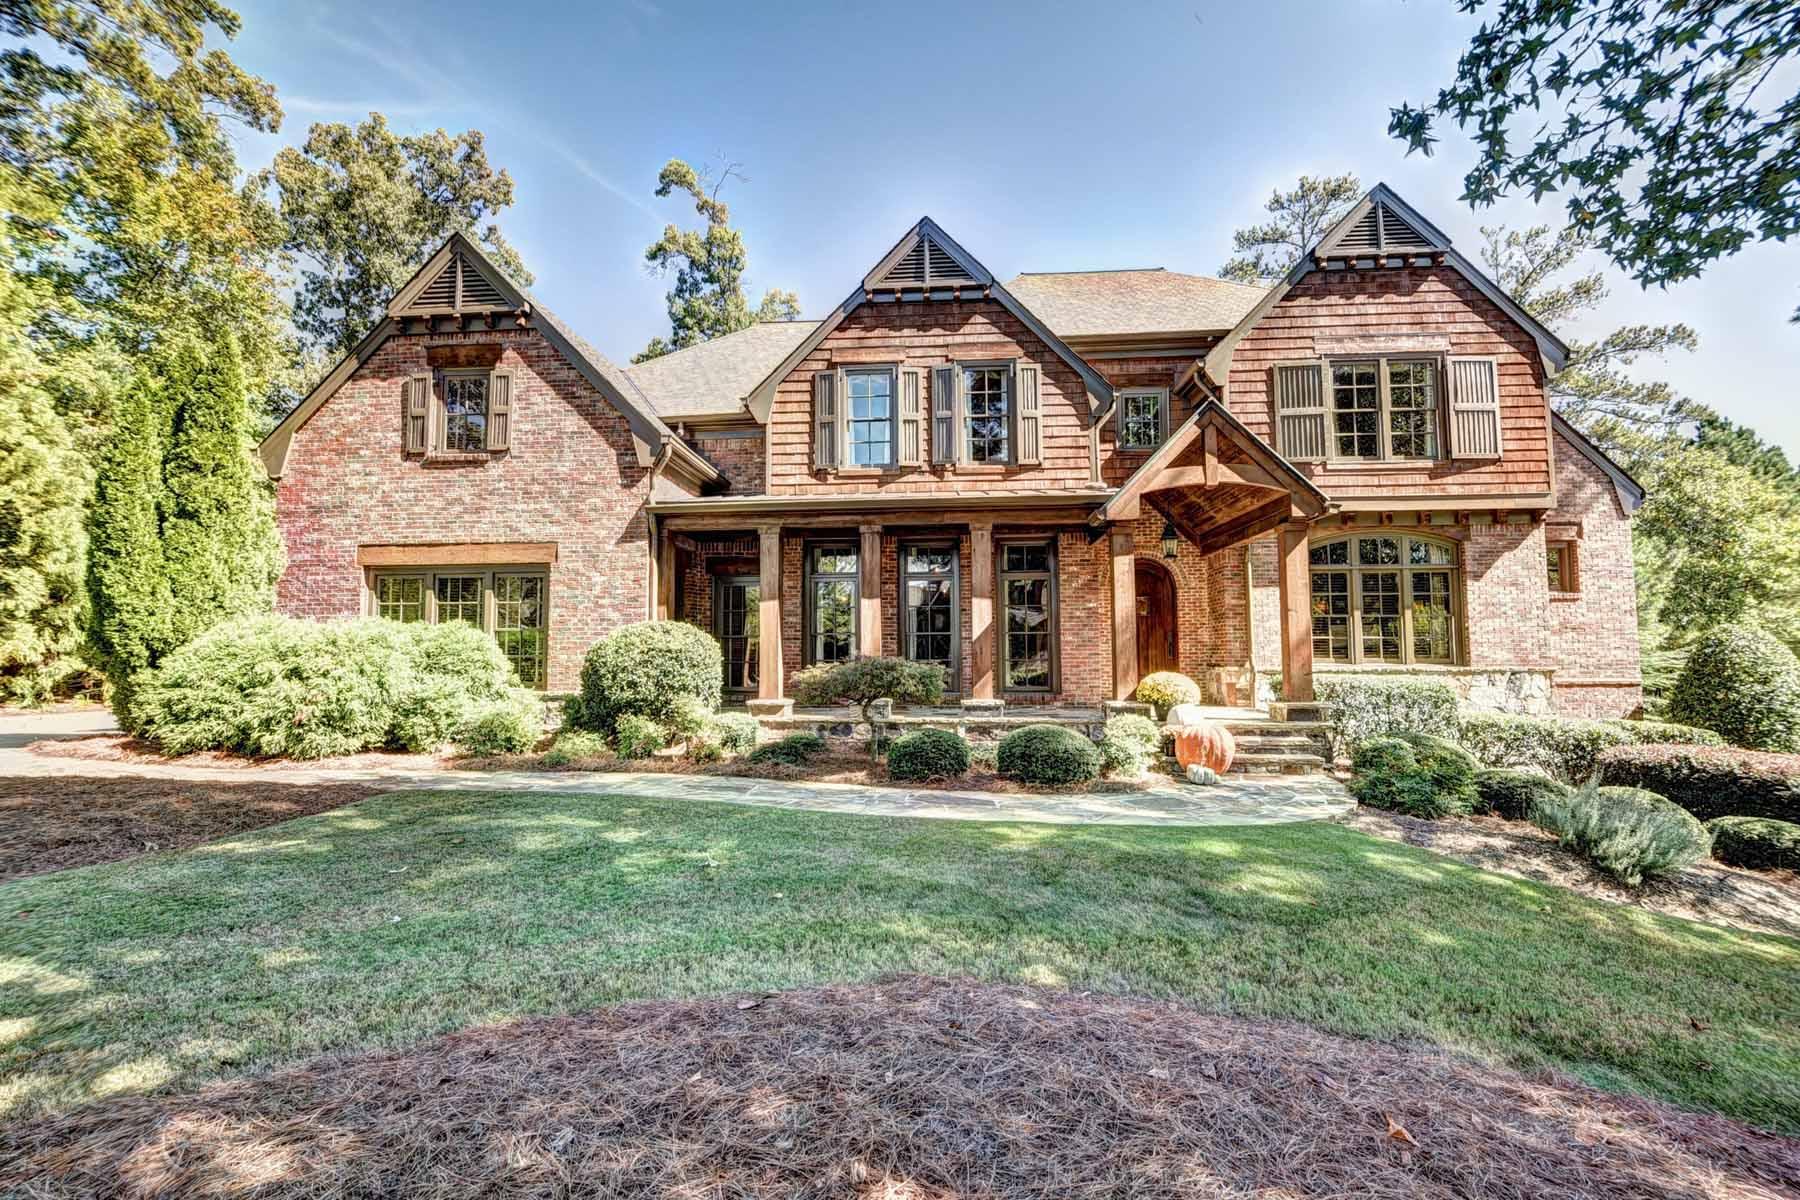 獨棟家庭住宅 為 出售 在 Rustic Elegance at The River Club 902 Little Darby Lane Suwanee, 喬治亞州, 30024 美國